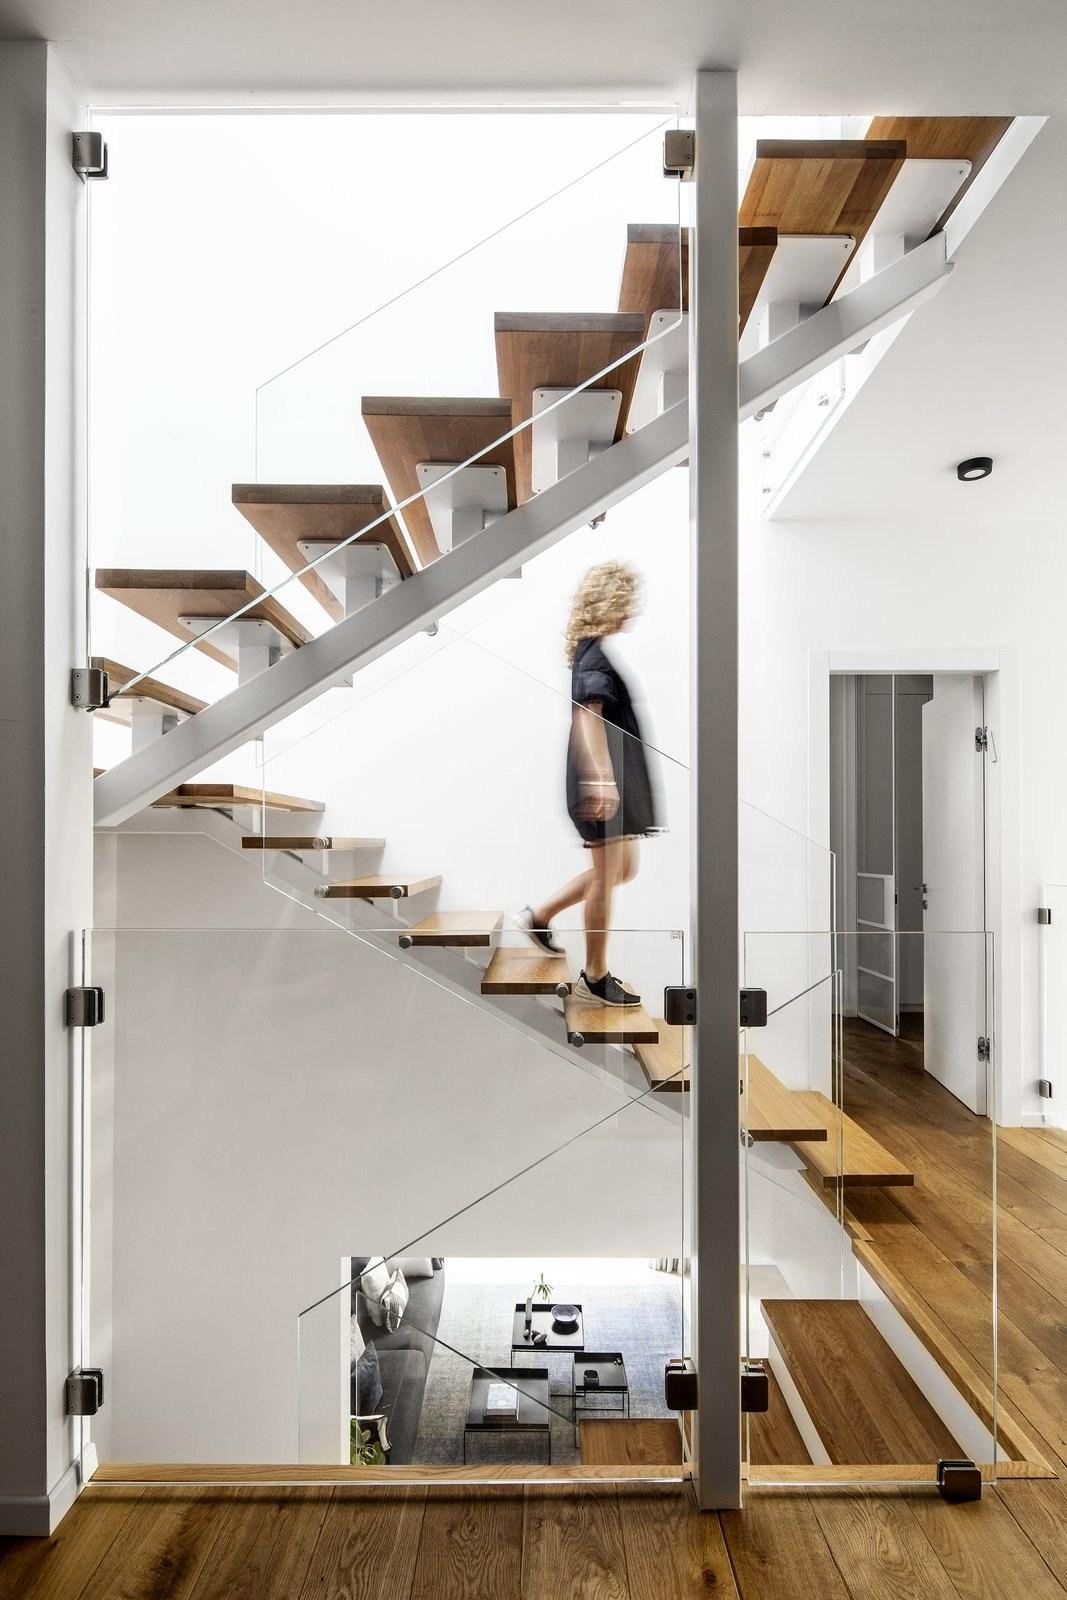 5 Modern Homes With Sophisticated Stairways Dwell | Second Floor Stairs Design | Floor Plan | Hall | 1St Floor Veranda | Outside | Most Beautiful